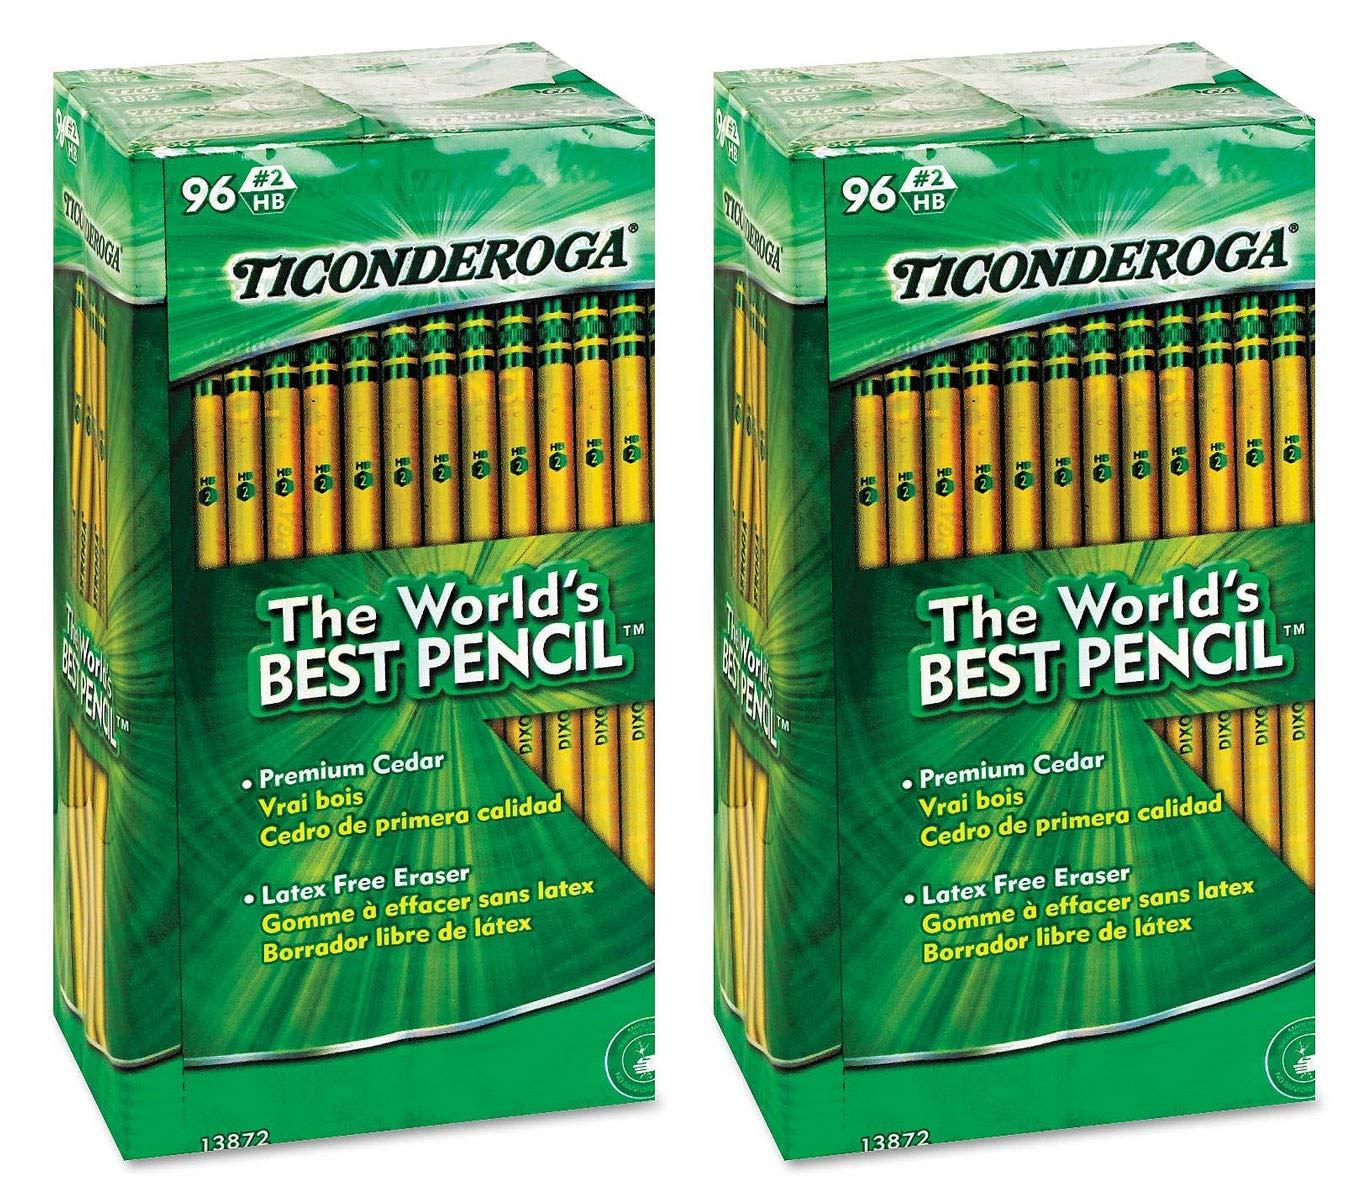 Dixon HDaUH Woodcase Pencil, HB #2, Yellow Barrel, 96/Pack 2 Pack